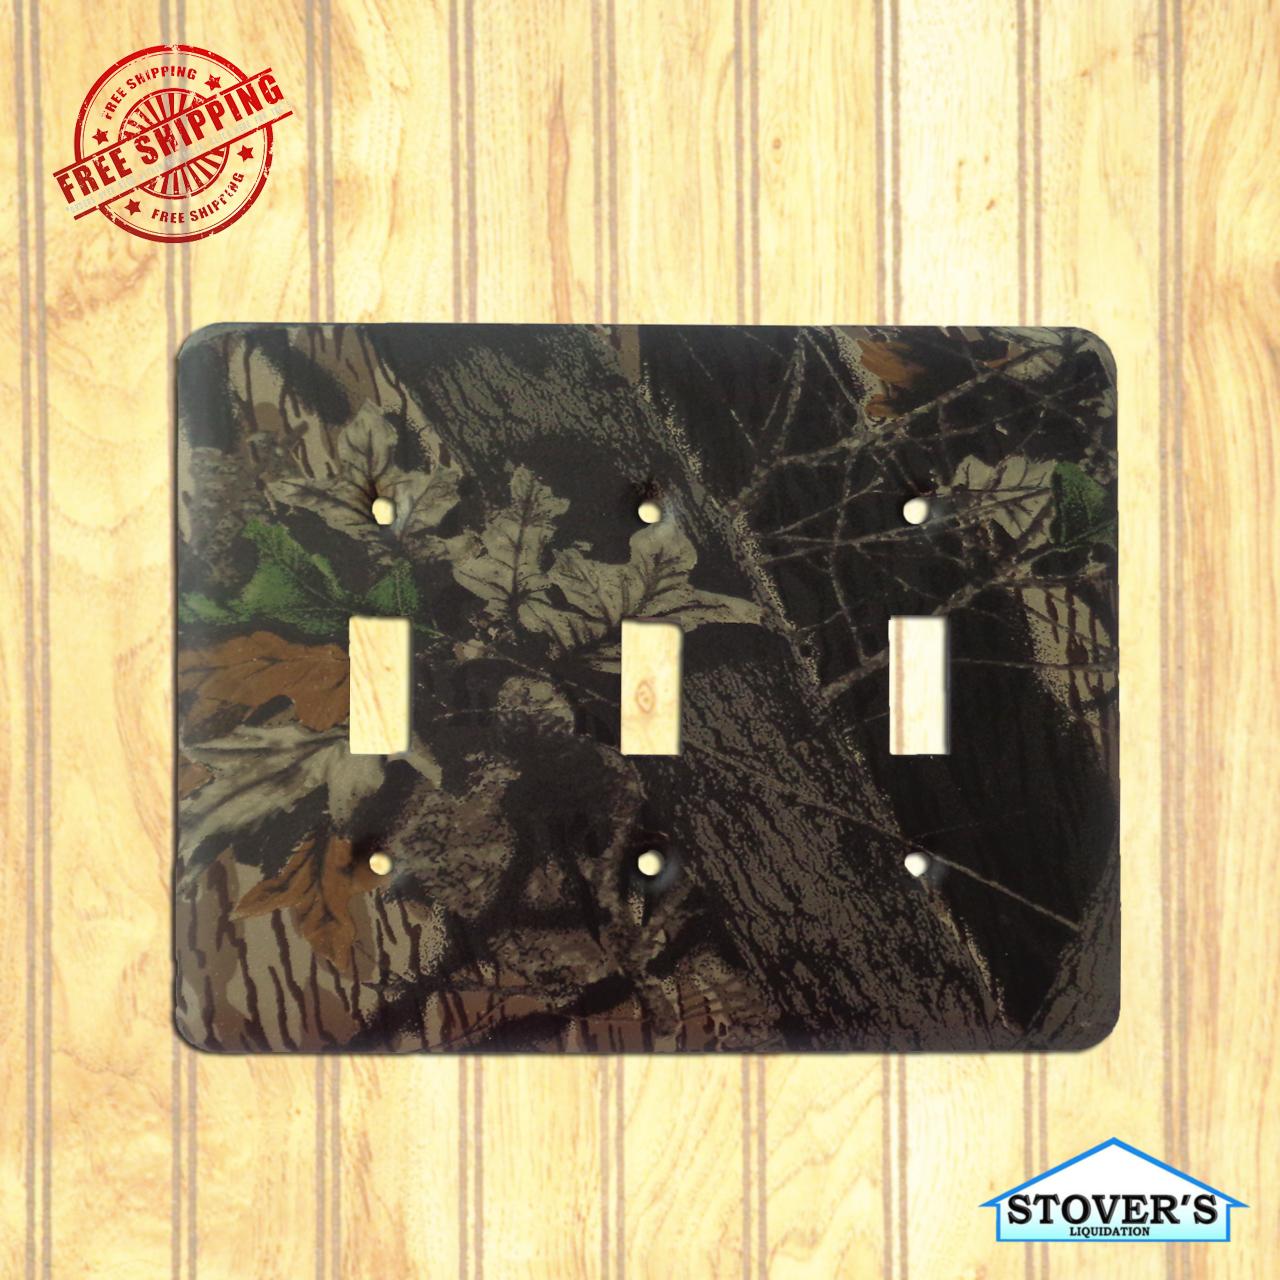 63043-triple-toggle-light-switch-plate-outdoors-camo-mossy-oak-breakup-stovers-liquidation.jpg